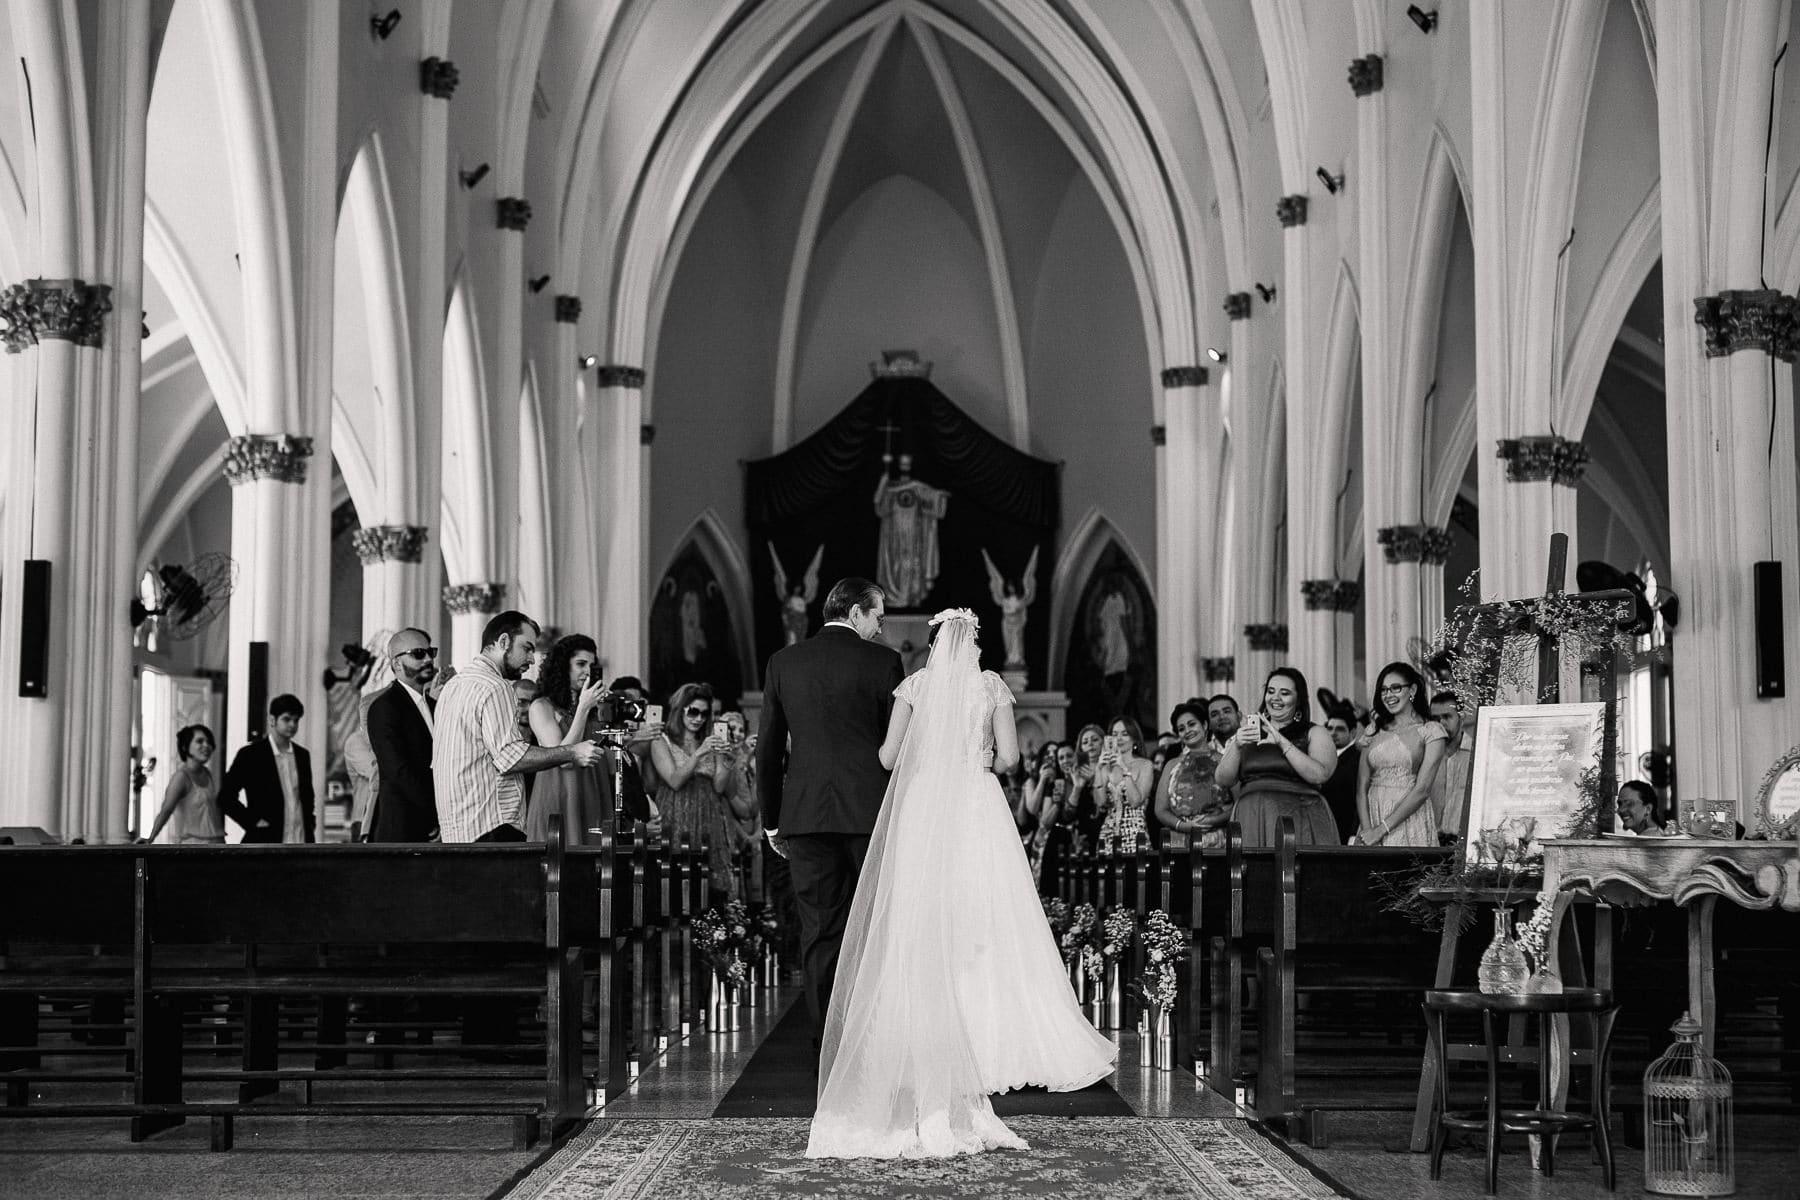 casamento-igreja-do-cristo-rei-fortaleza-20